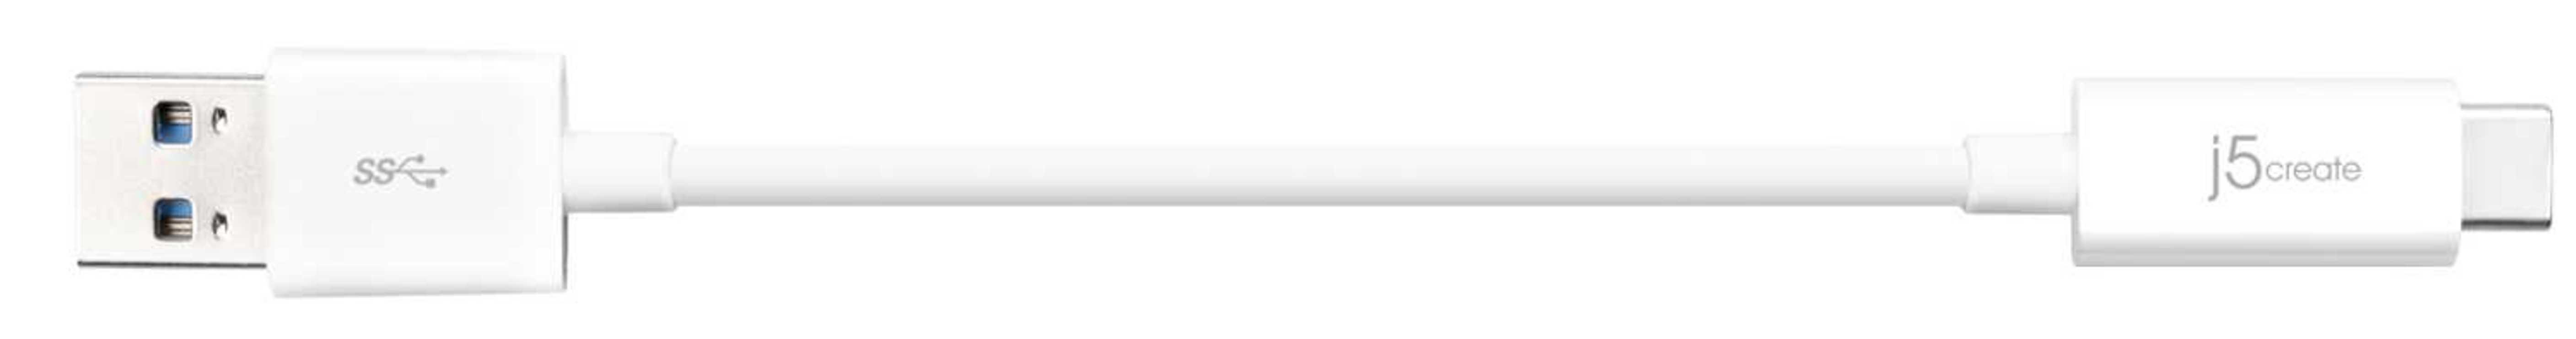 CORDON USB TYPE C - USB 3.1 VERS USB A 90 CM jucx06-3